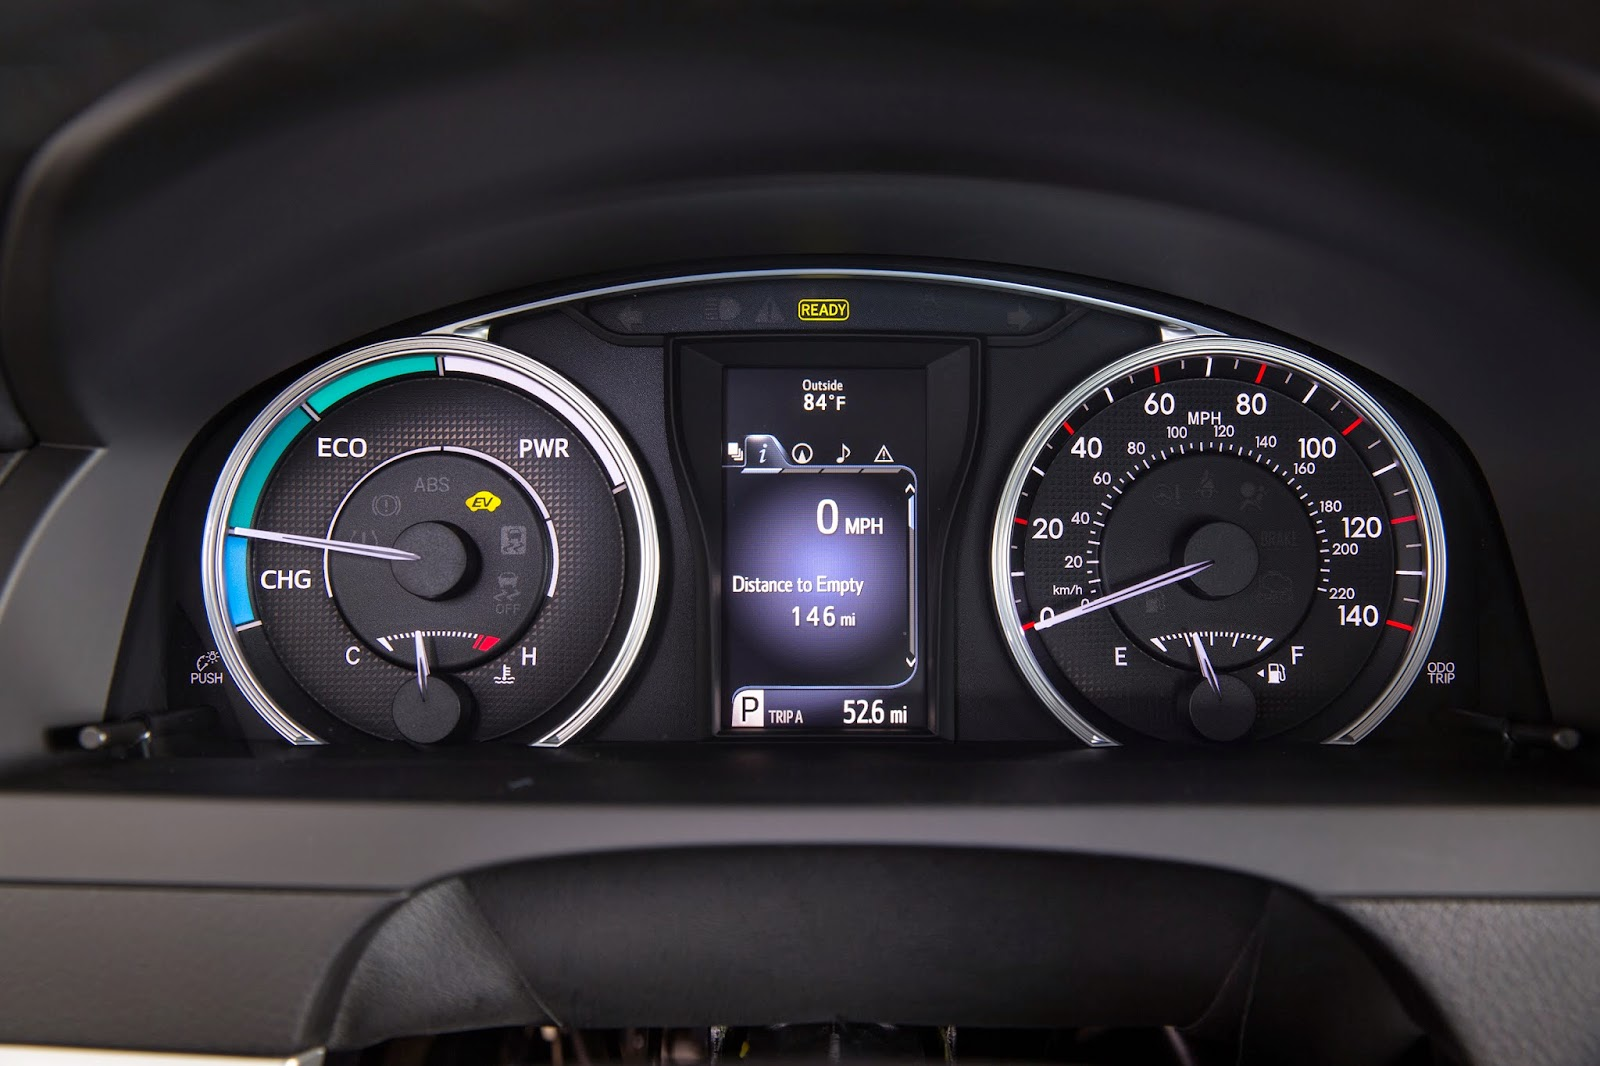 Gauge cluster of 2015 Toyota Camry Hybrid